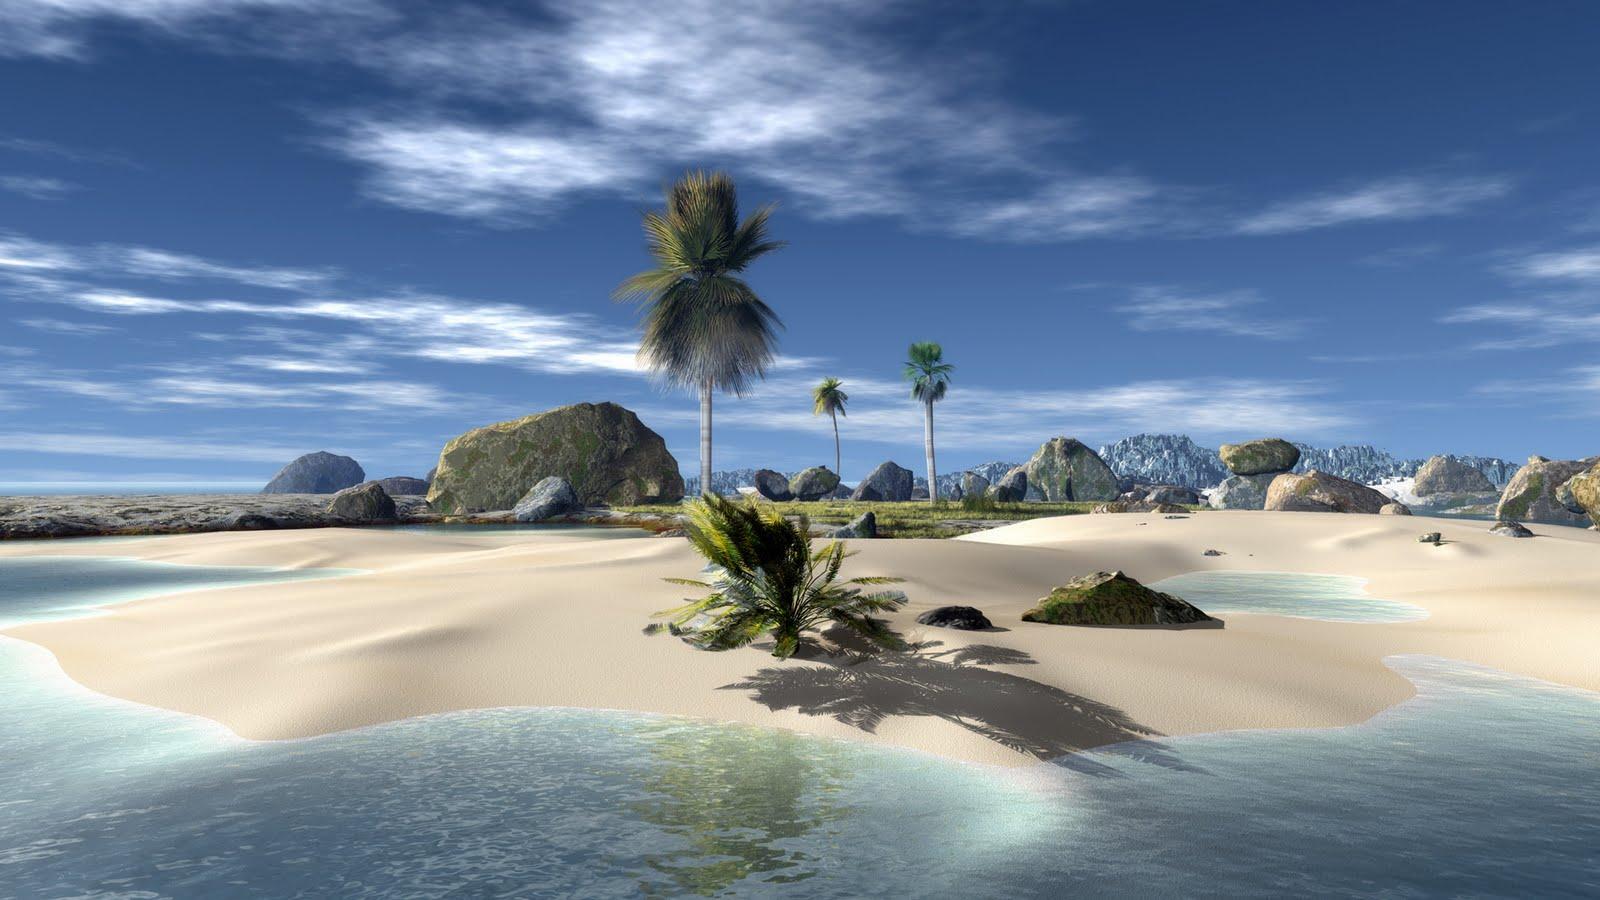 Paradise Beach   HD Beach Wallpapers HD Wallpapers Source 1600x900